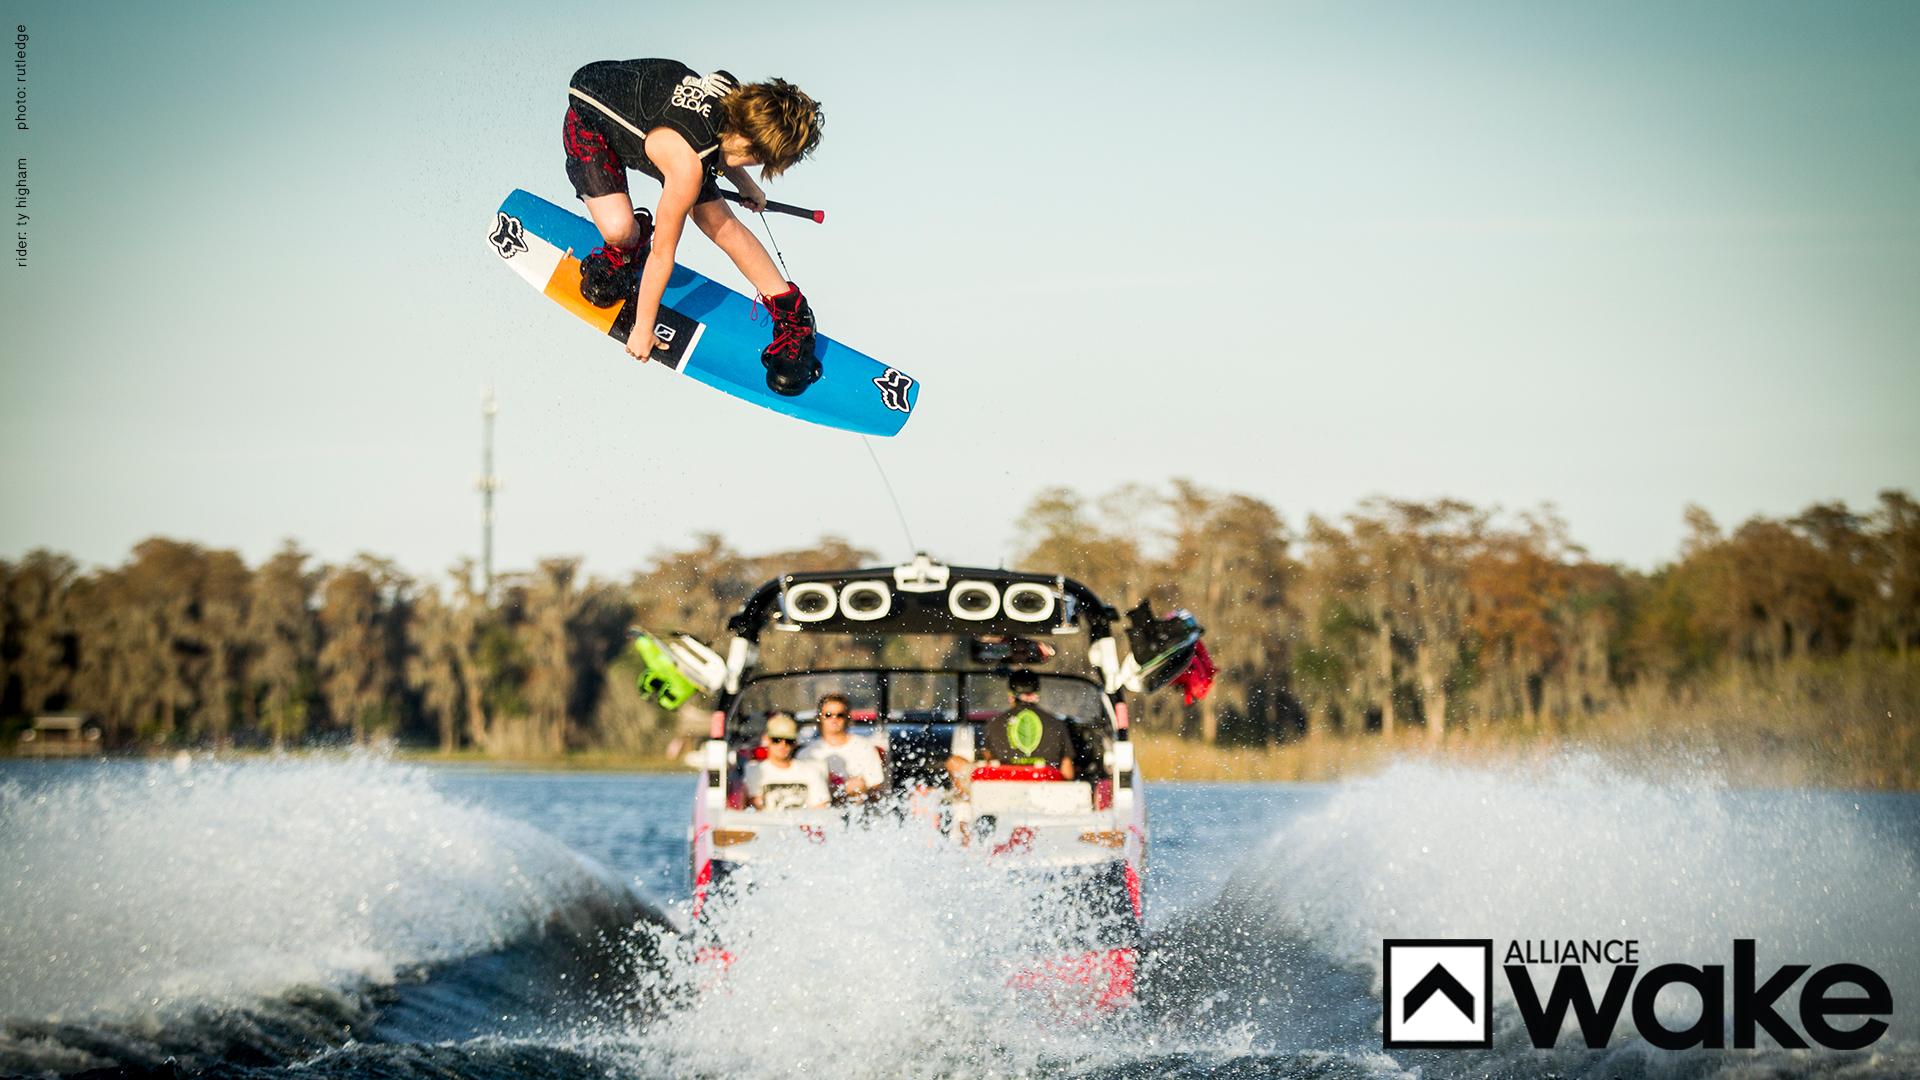 Wakeboarding Boat Wallpaper Wallpapers: Wee...